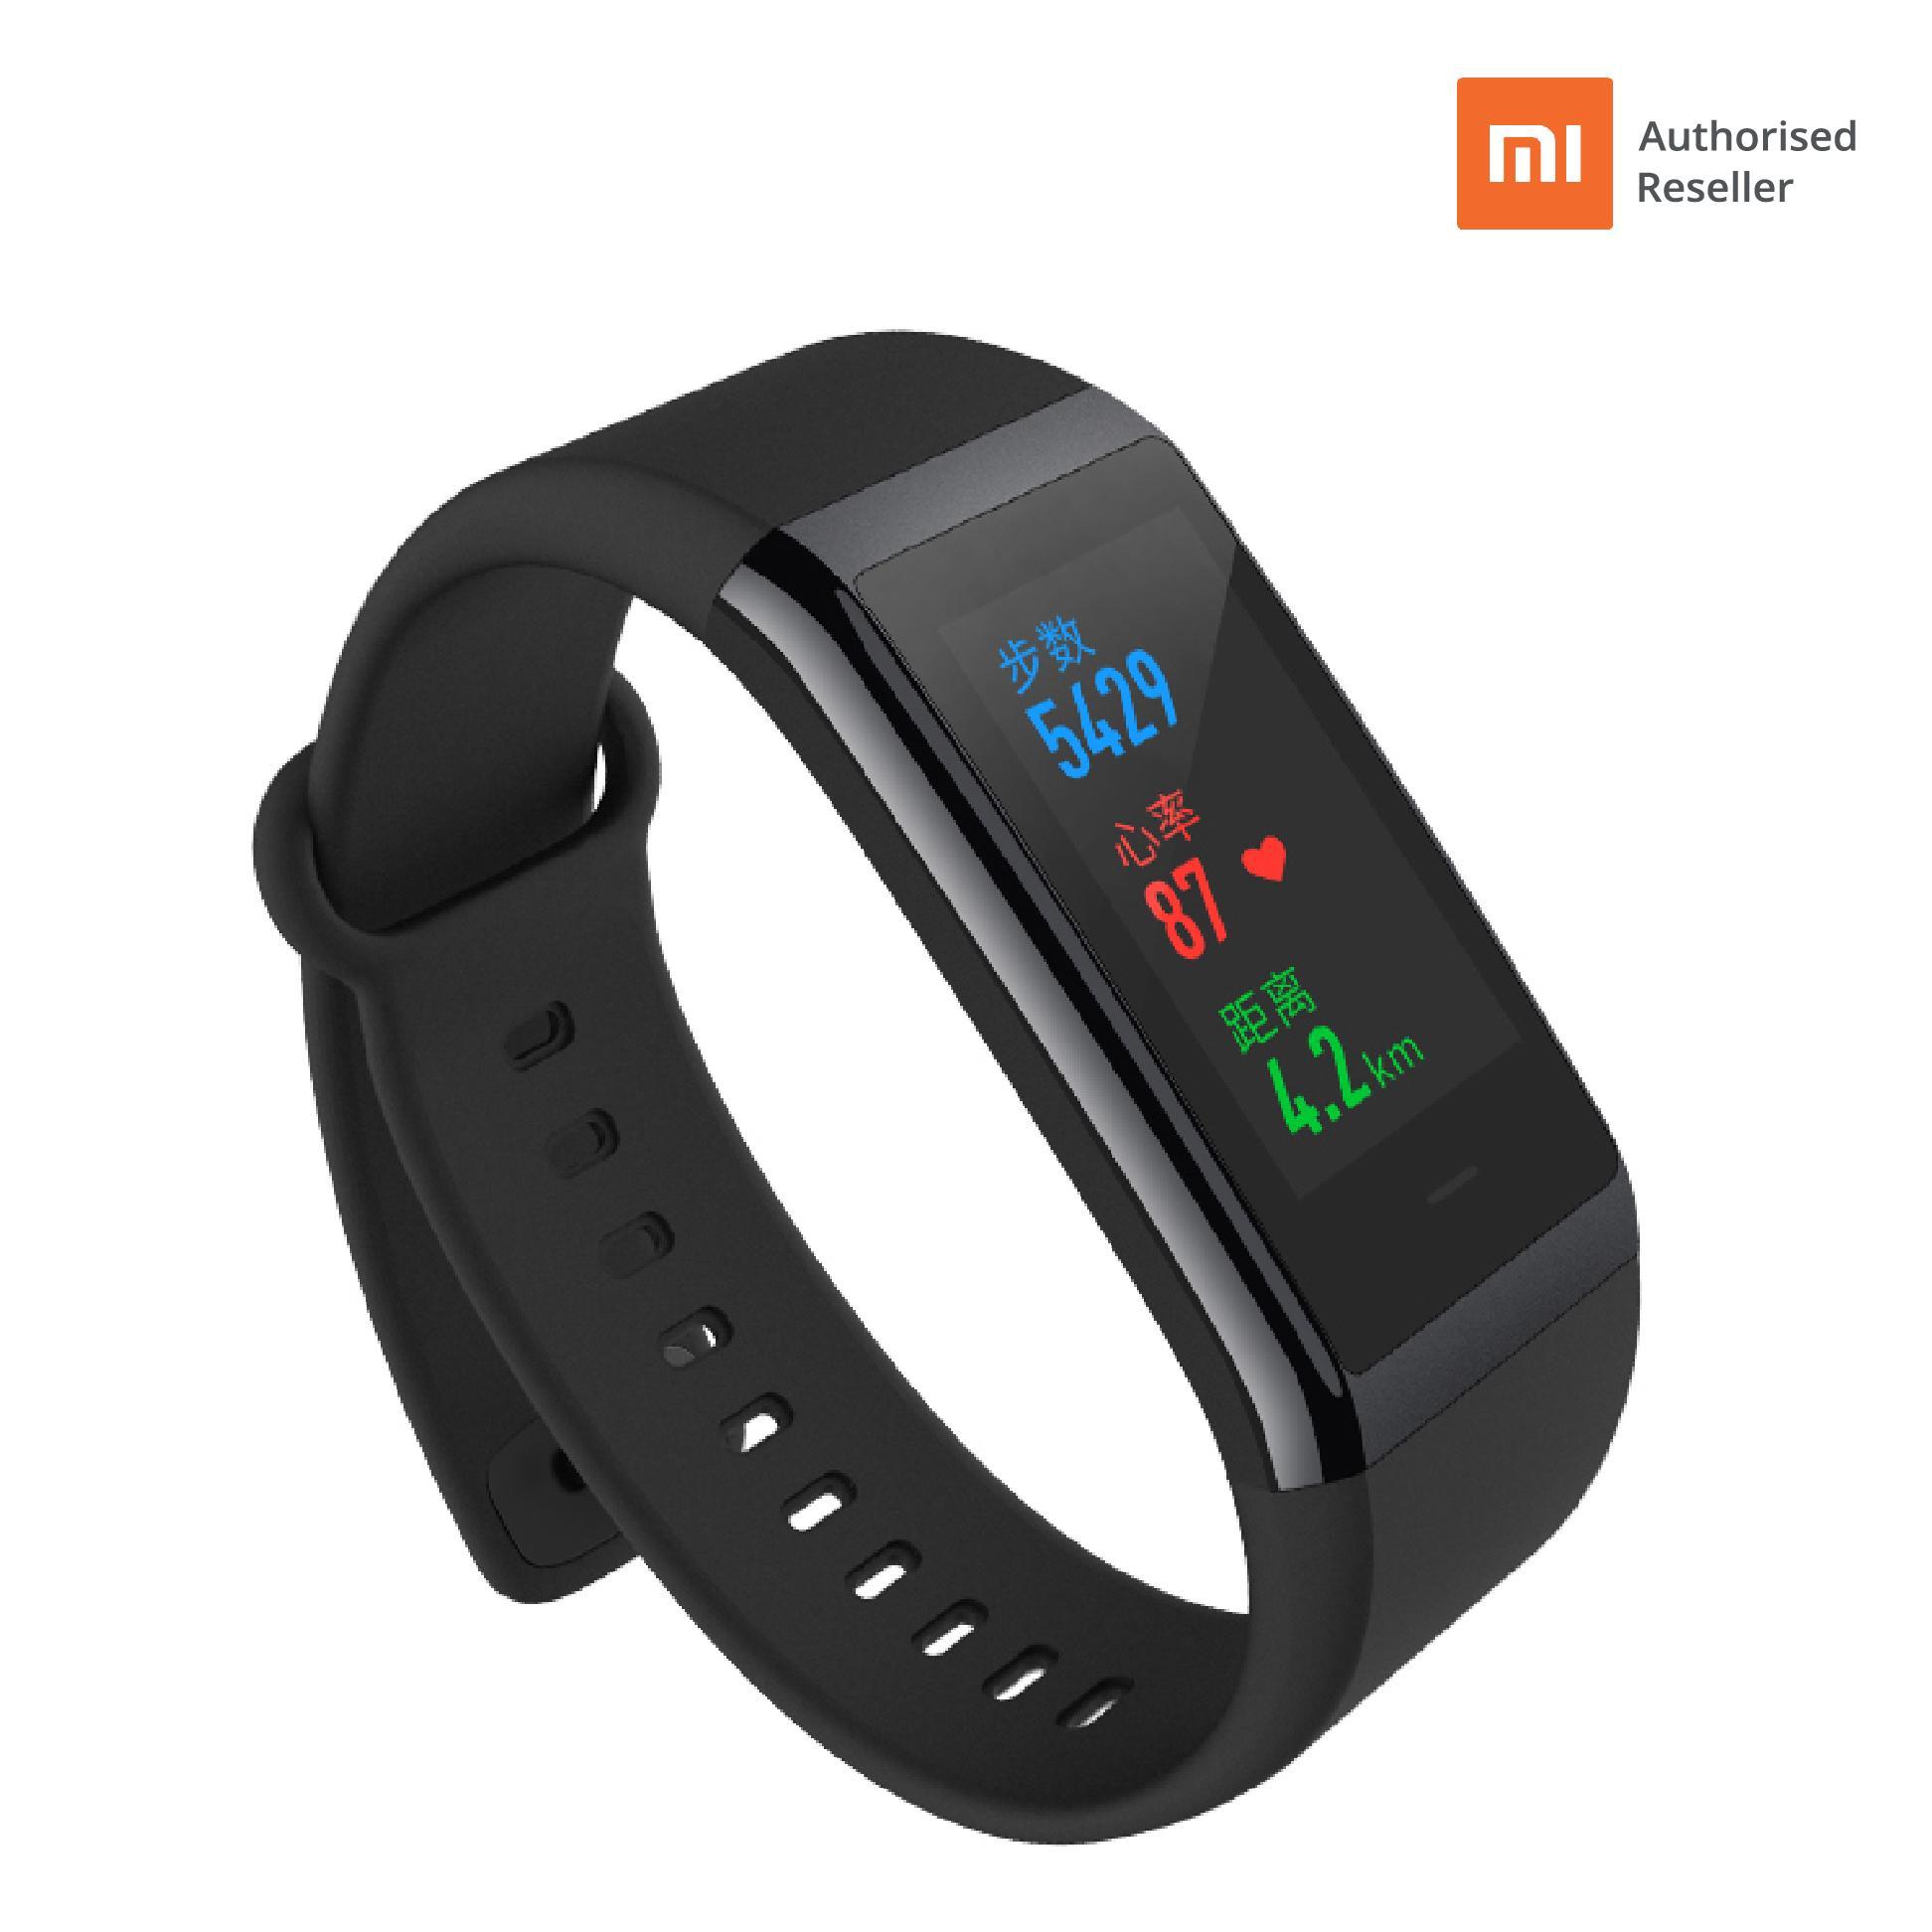 Xiaomi Amazfit Cor นาฬิกาอัจฉริยะ จอสีระบบสัมผัส รับประกันศูนย์ 1 ปี